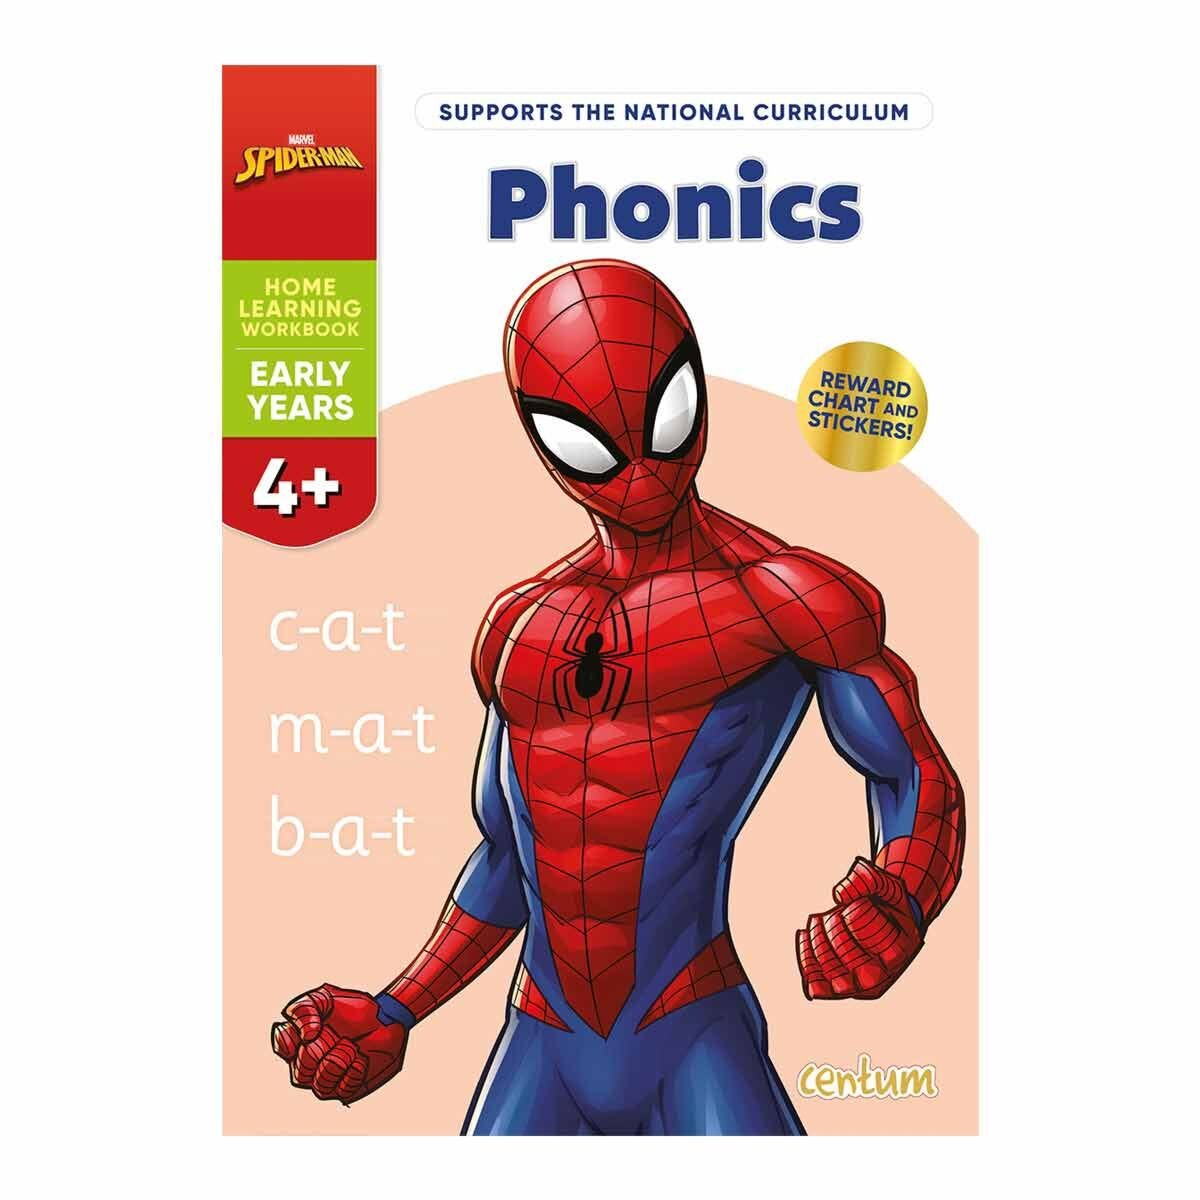 Centum Disney Learning Spiderman Phonics 4